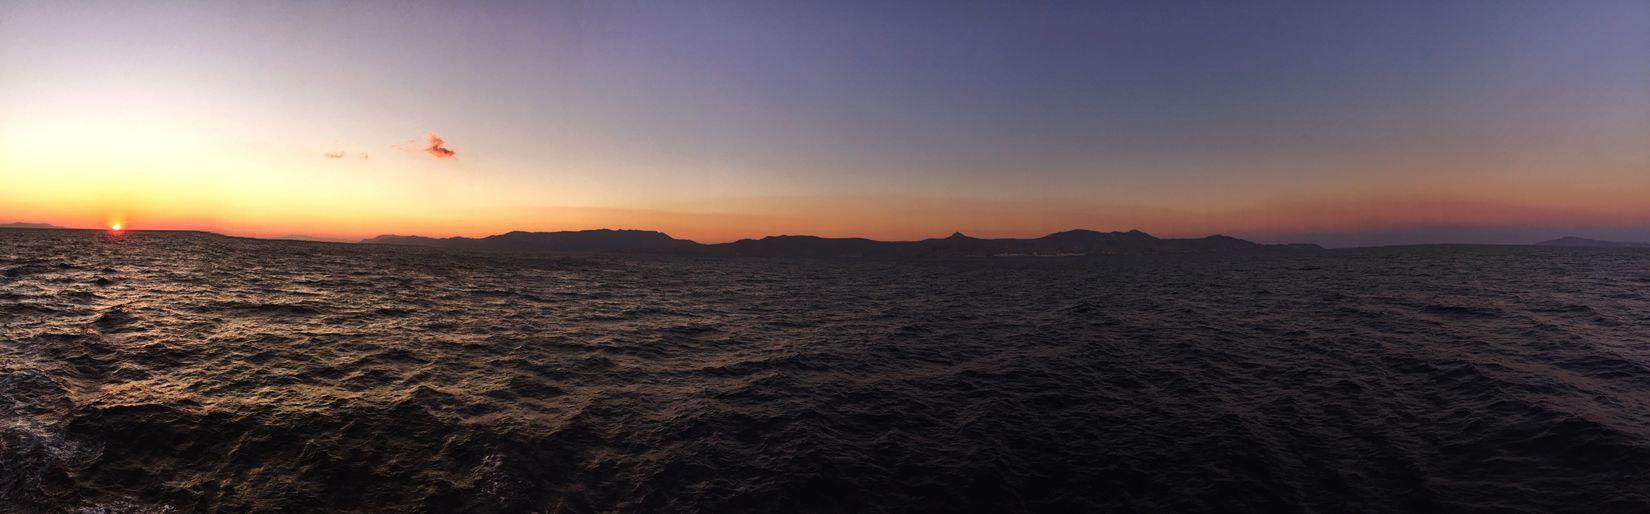 Greek Isles Greece Yachting